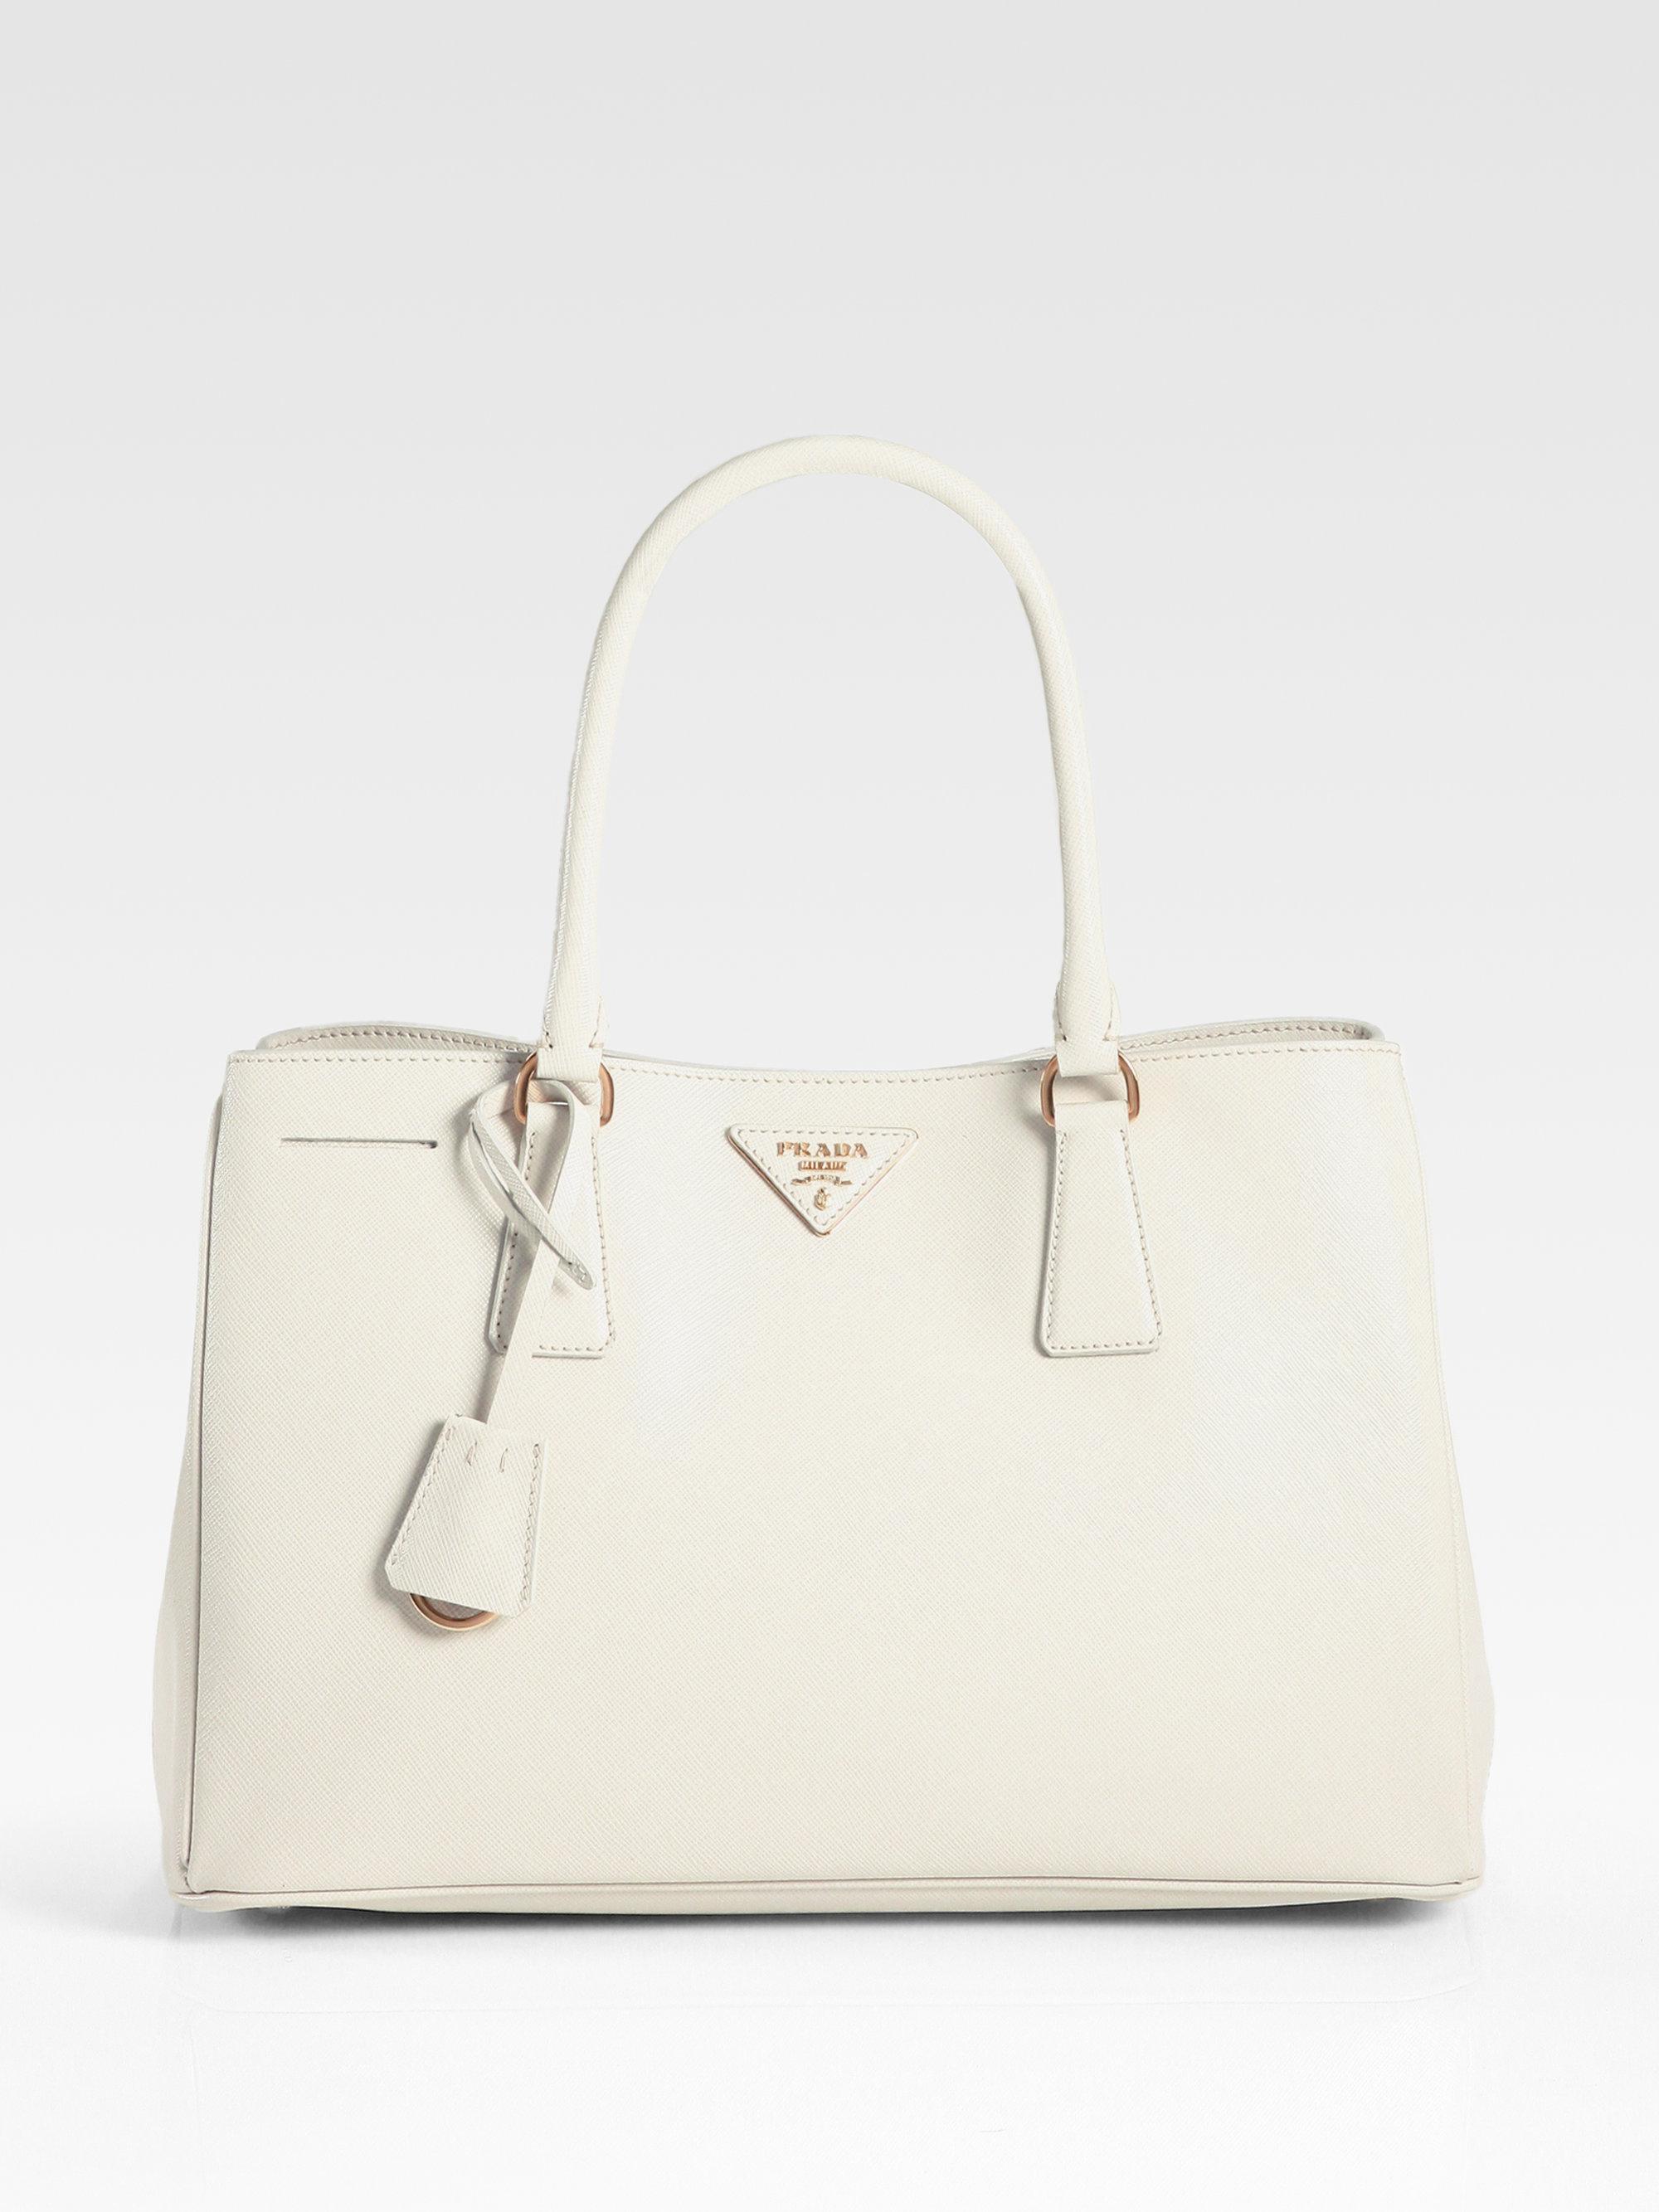 Prada Saffiano Medium Tote Bag in White (off white) | Lyst